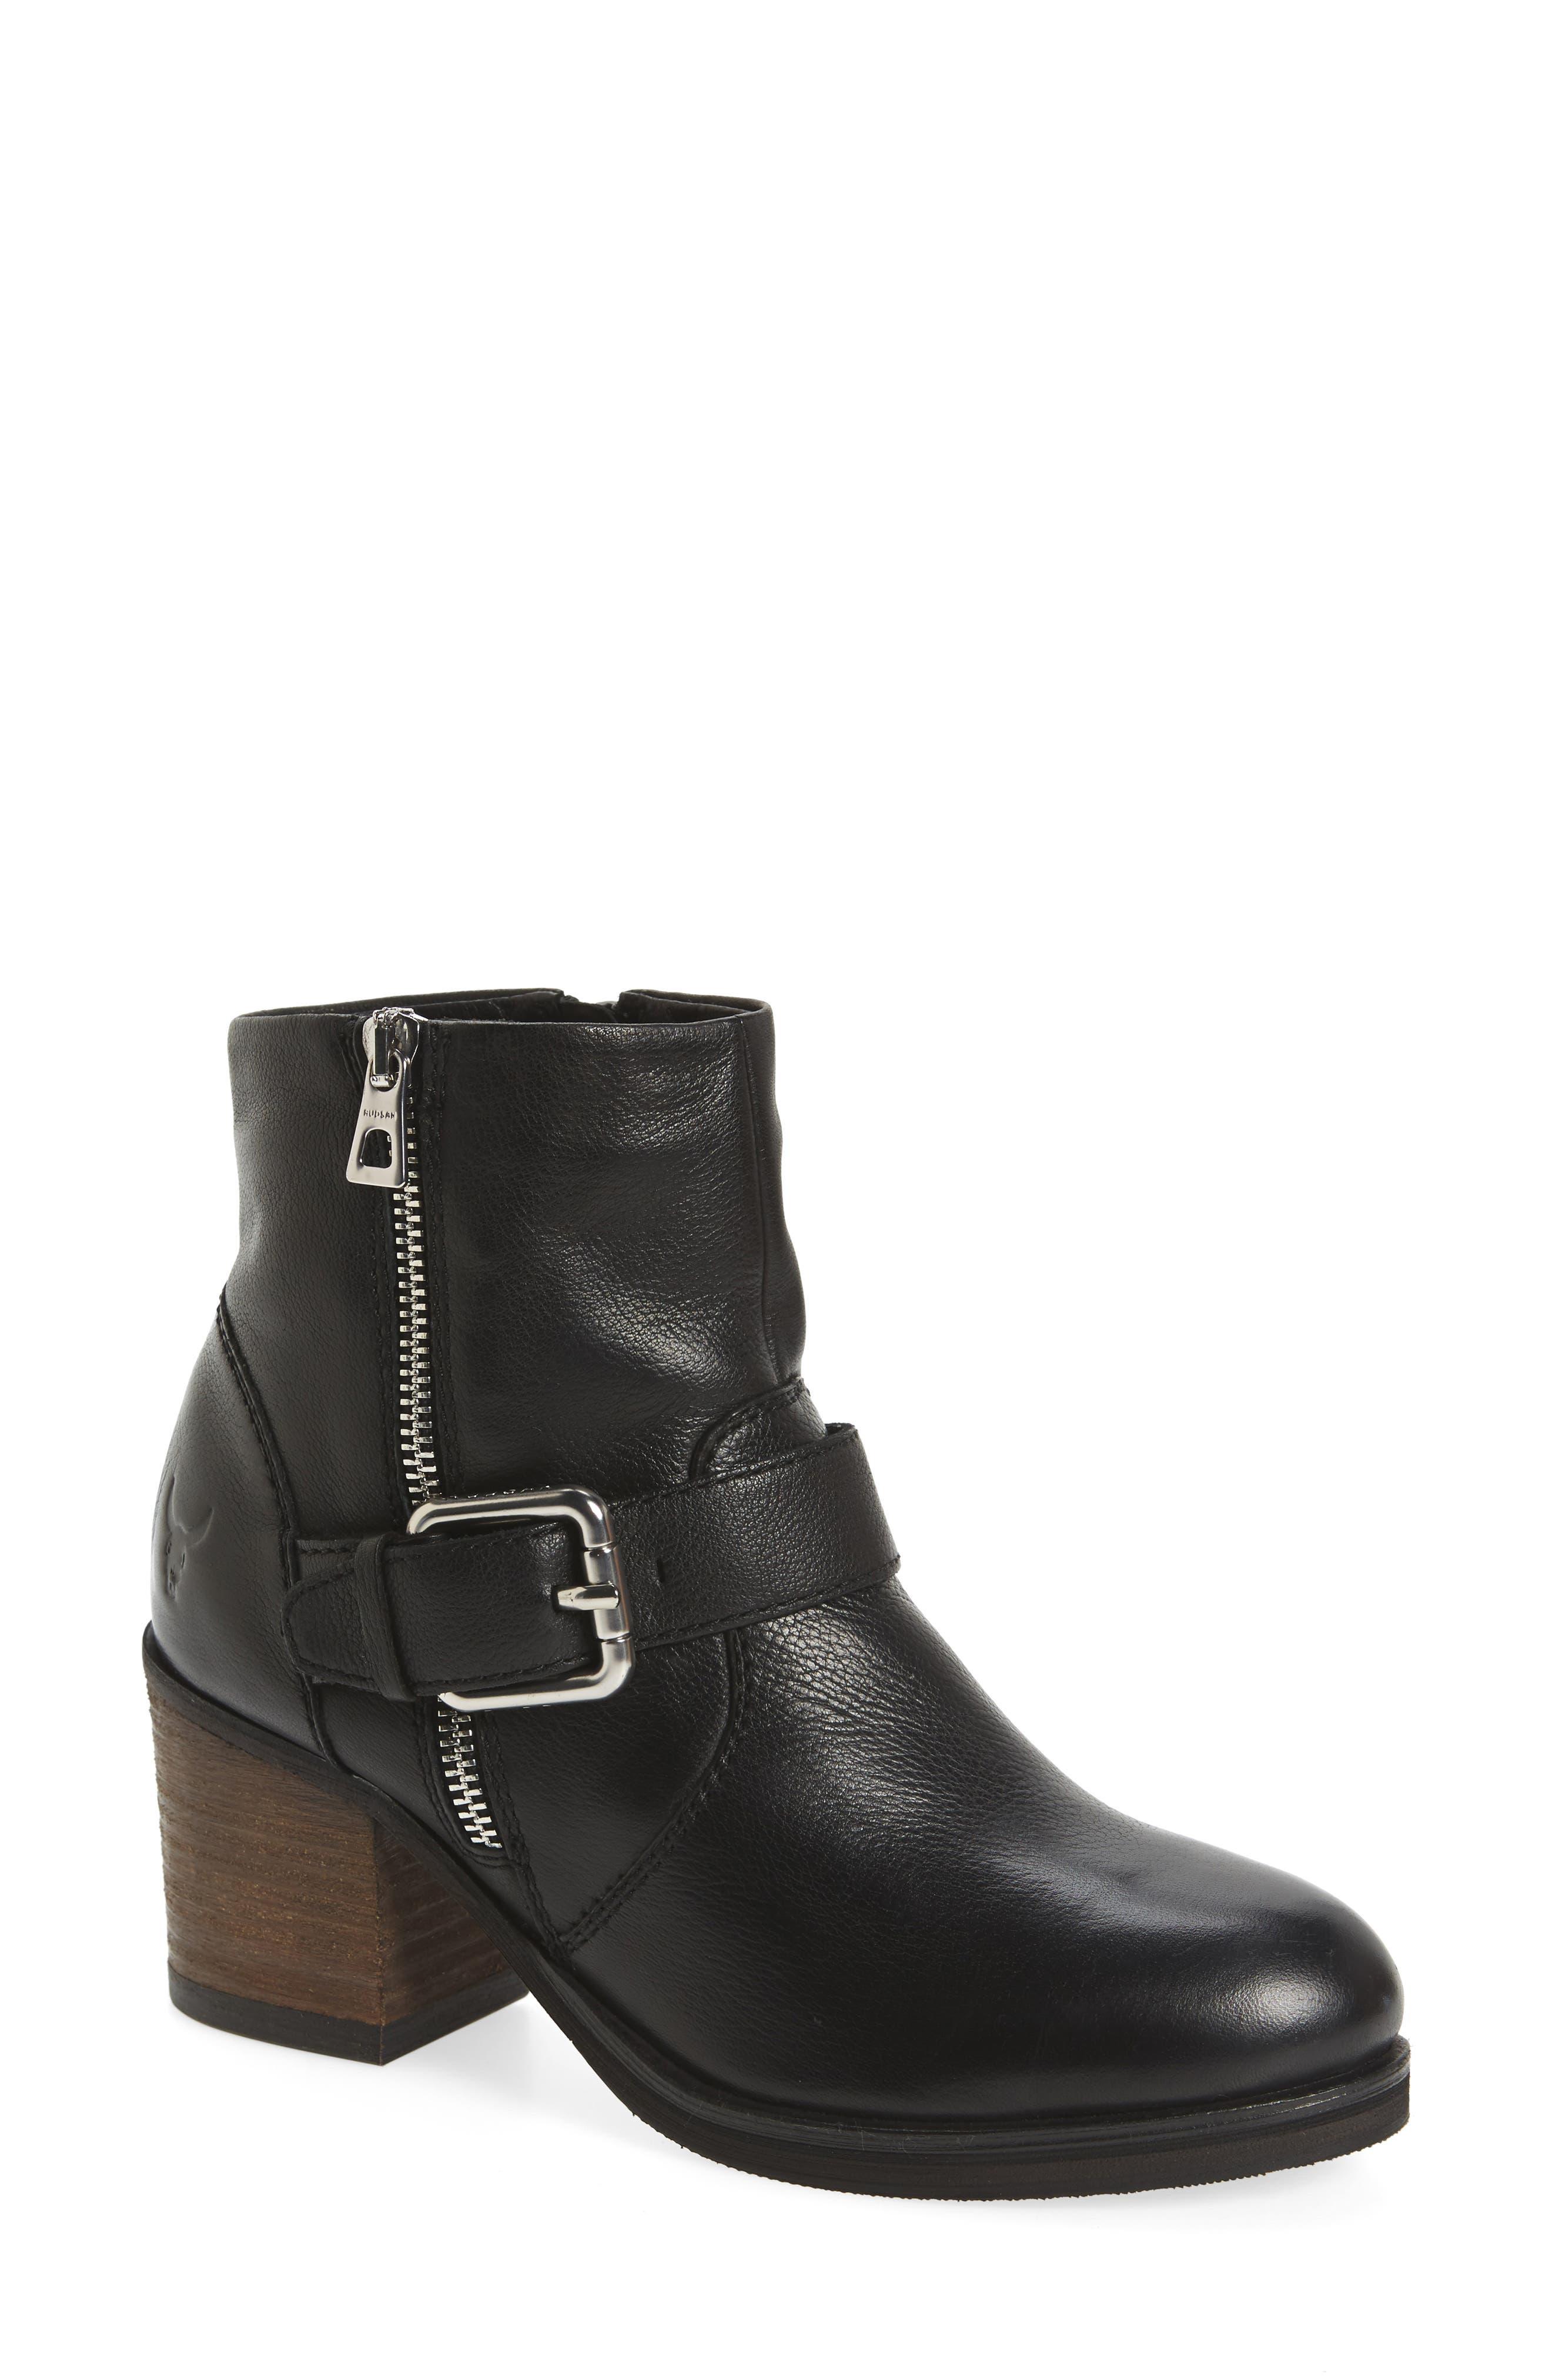 Balady Boot,                             Main thumbnail 1, color,                             Black/ Black Leather